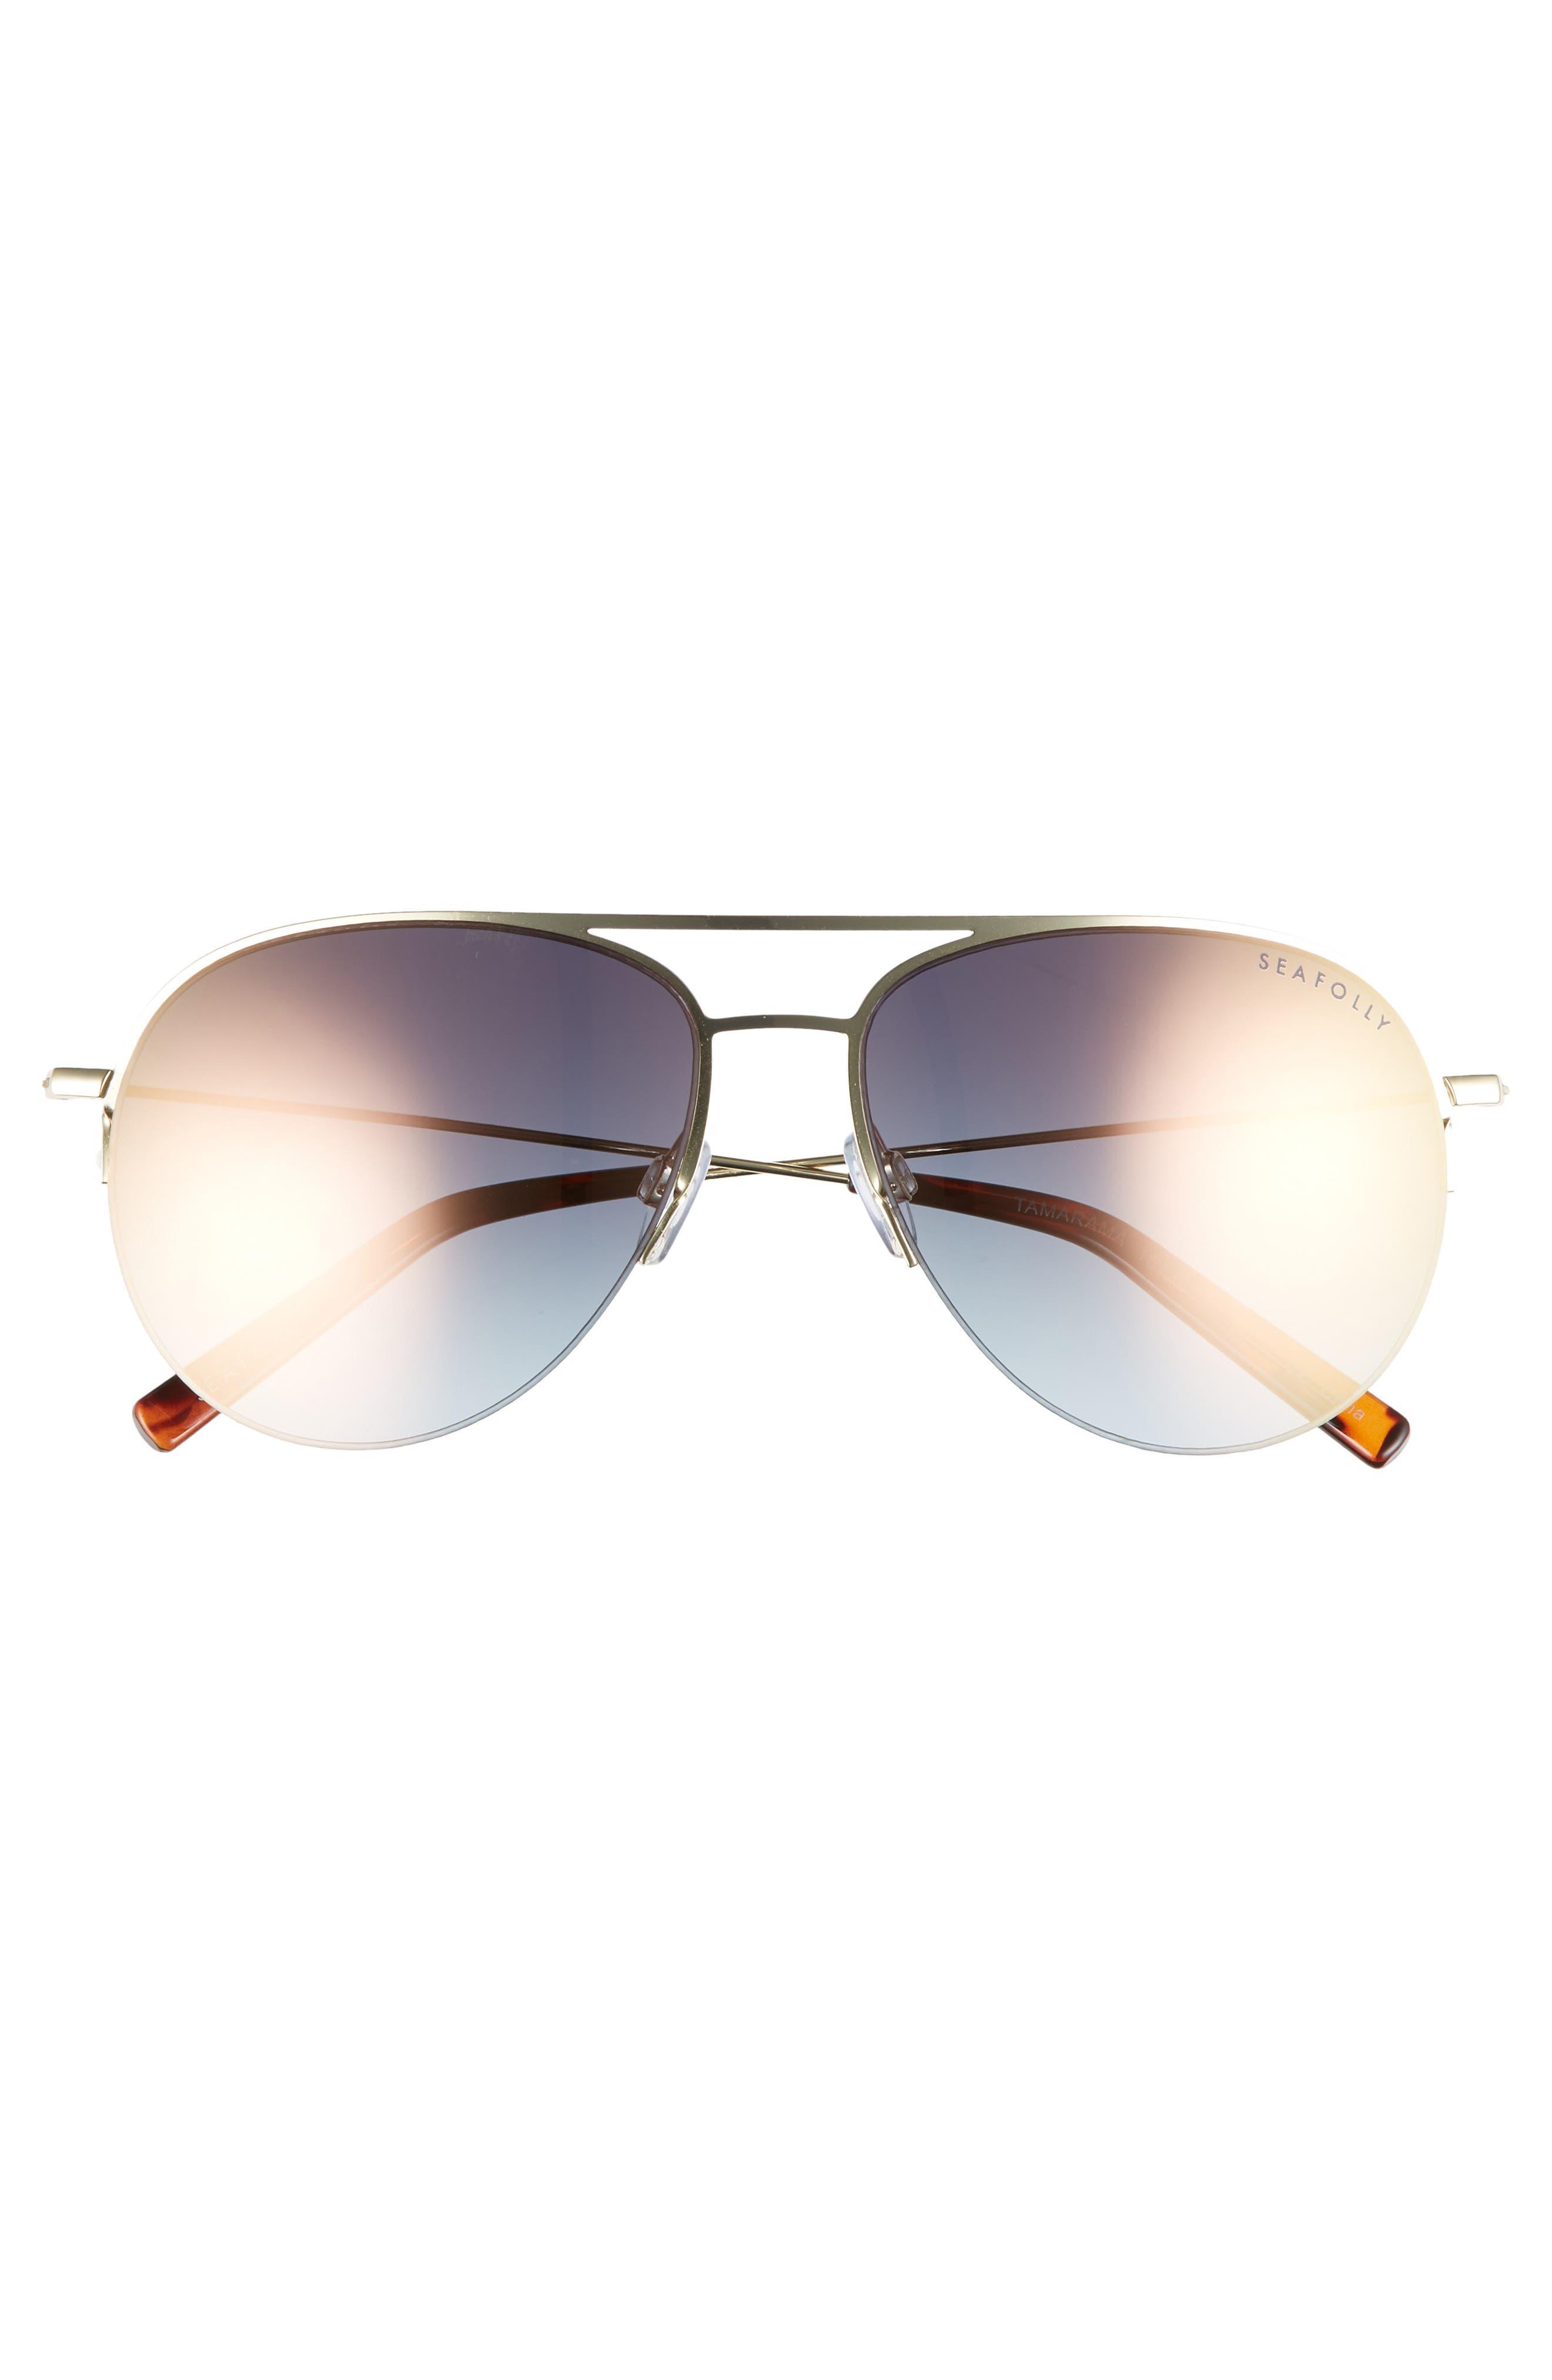 Tamarama 60mm Aviator Sunglasses,                             Alternate thumbnail 3, color,                             Gold